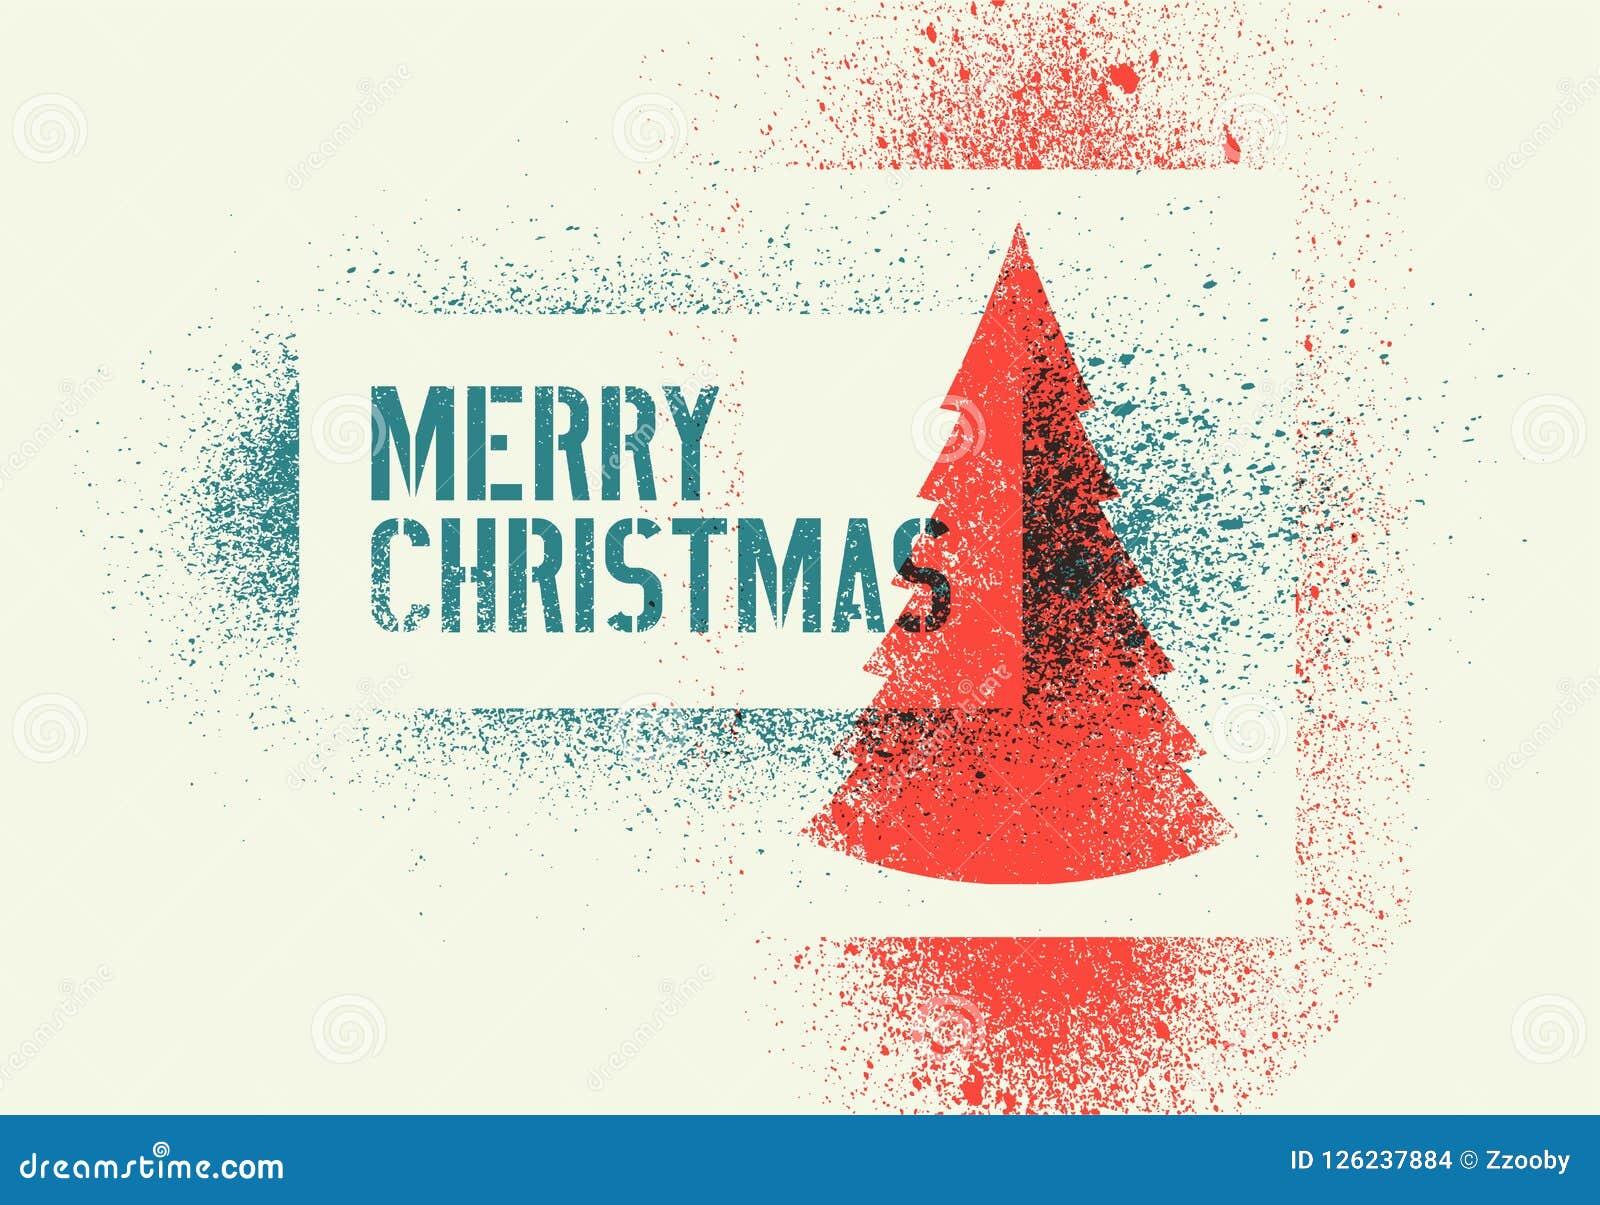 Typographic Vintage Grunge Stencil Splash Style Christmas Greeting